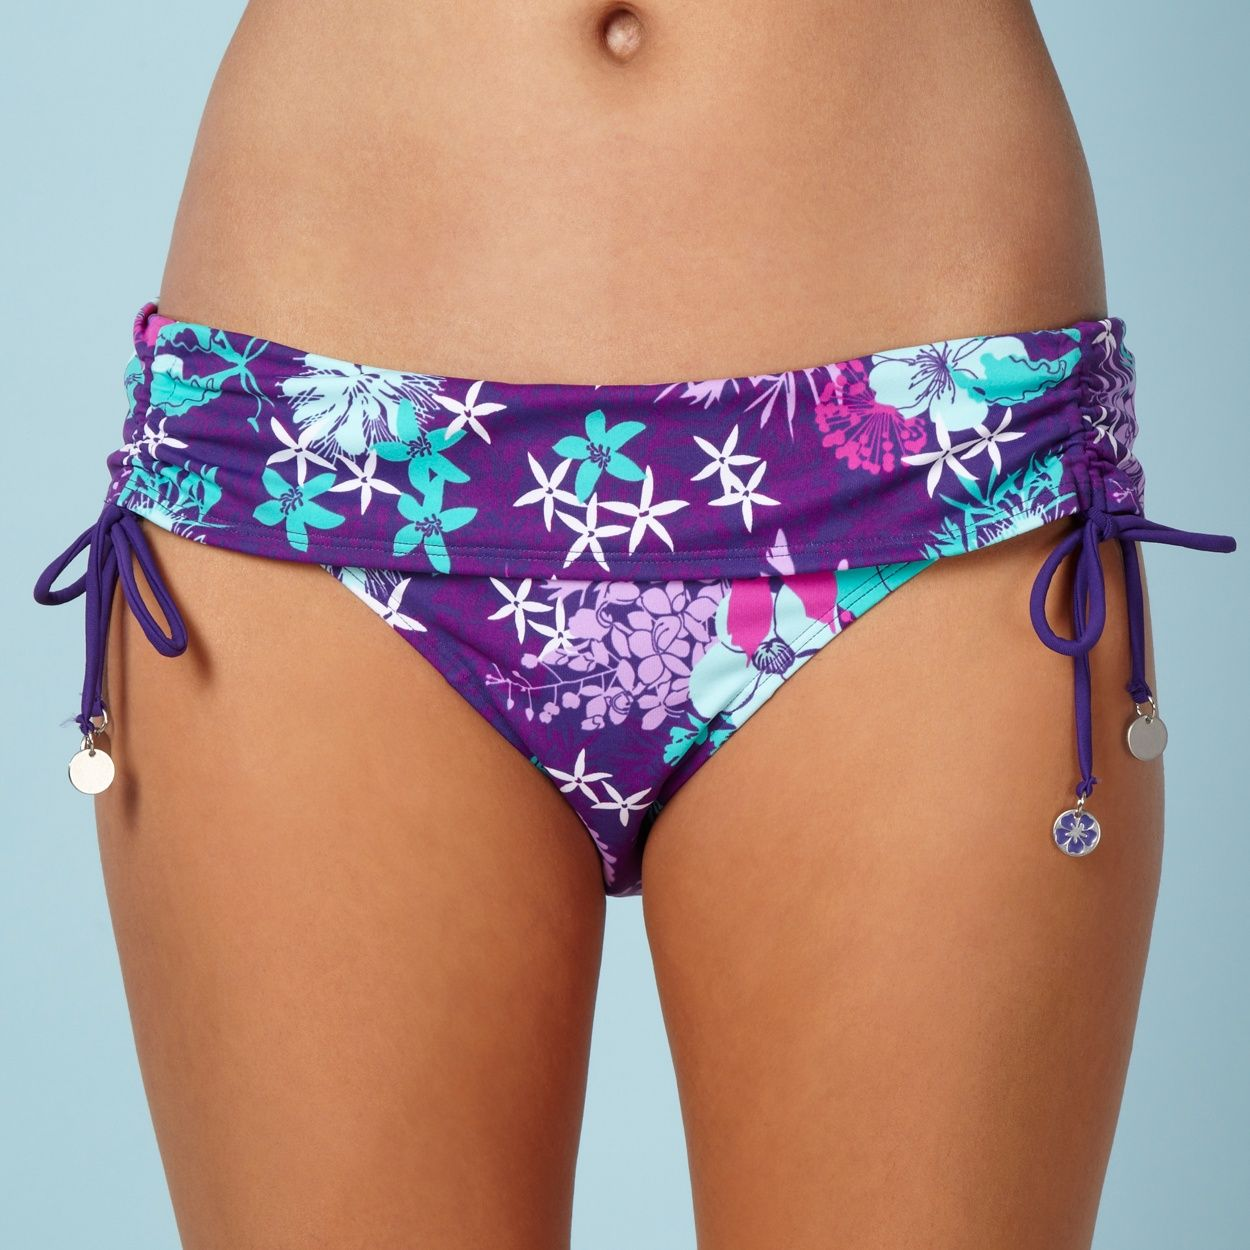 Mantaray Purple Floral Fold Bikini Bottoms At Debenhamscom My